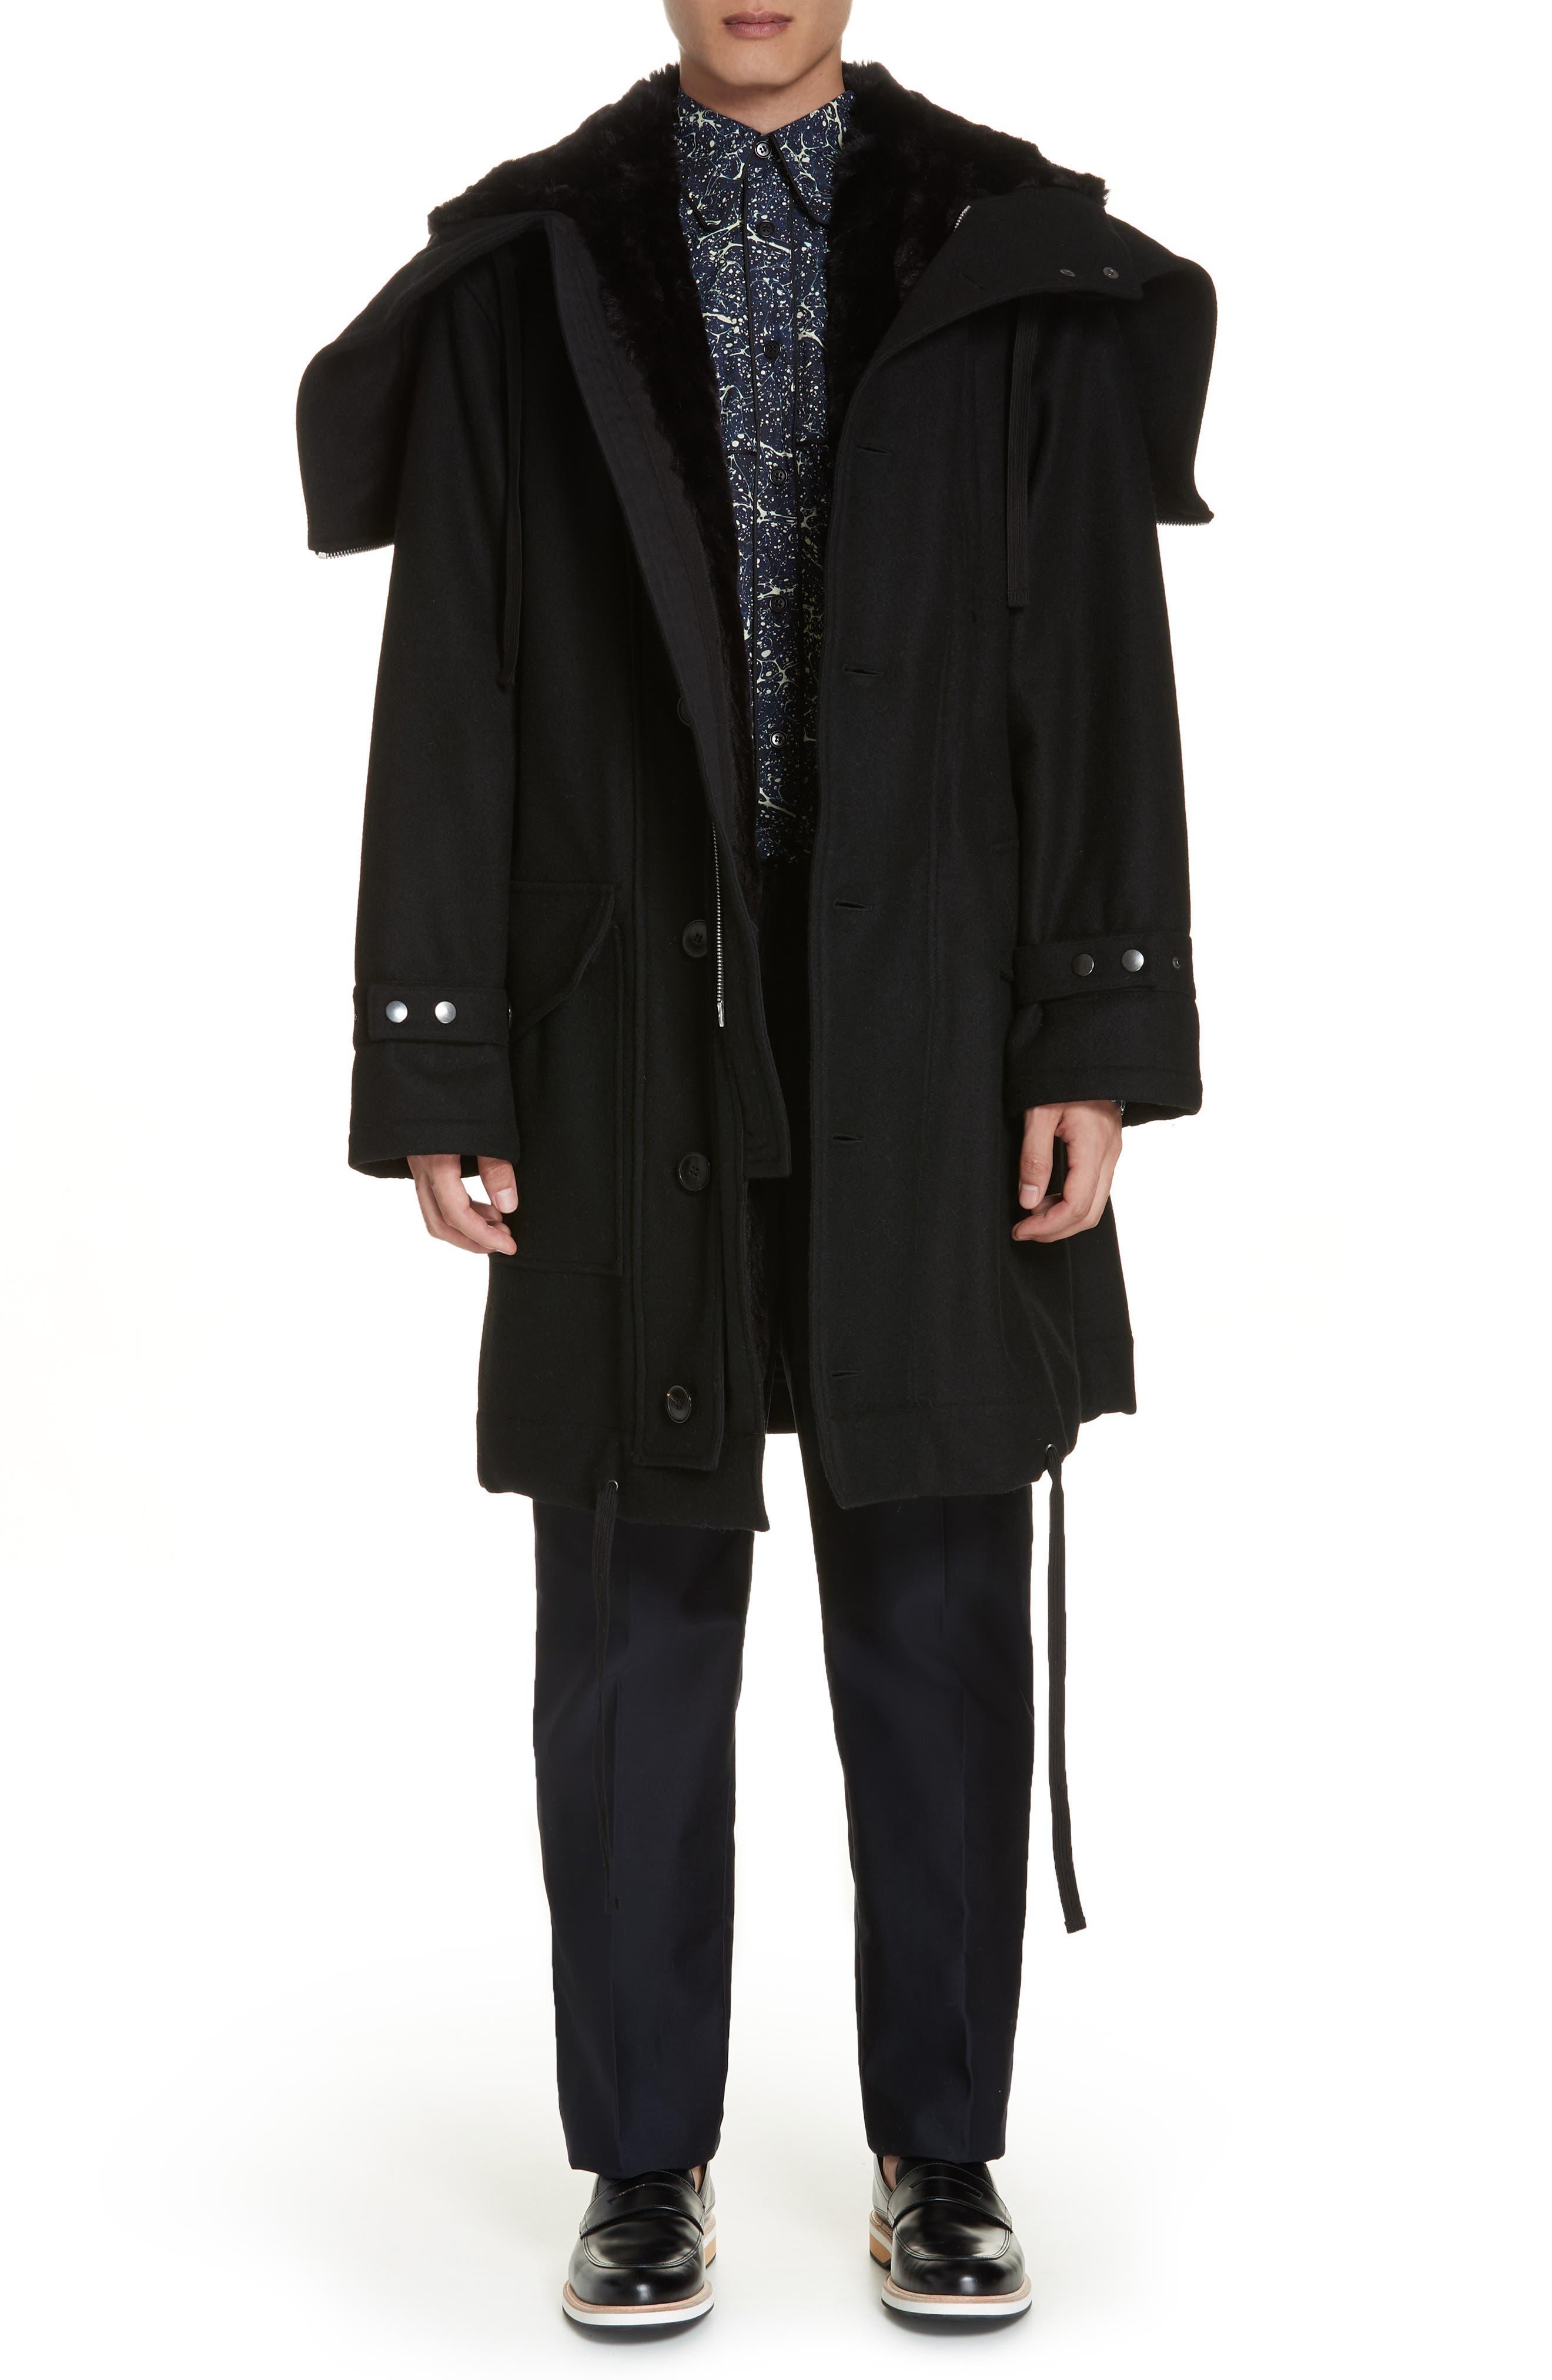 Verreli Hooded Parka with Faux Fur Trim,                             Alternate thumbnail 8, color,                             BLACK 900